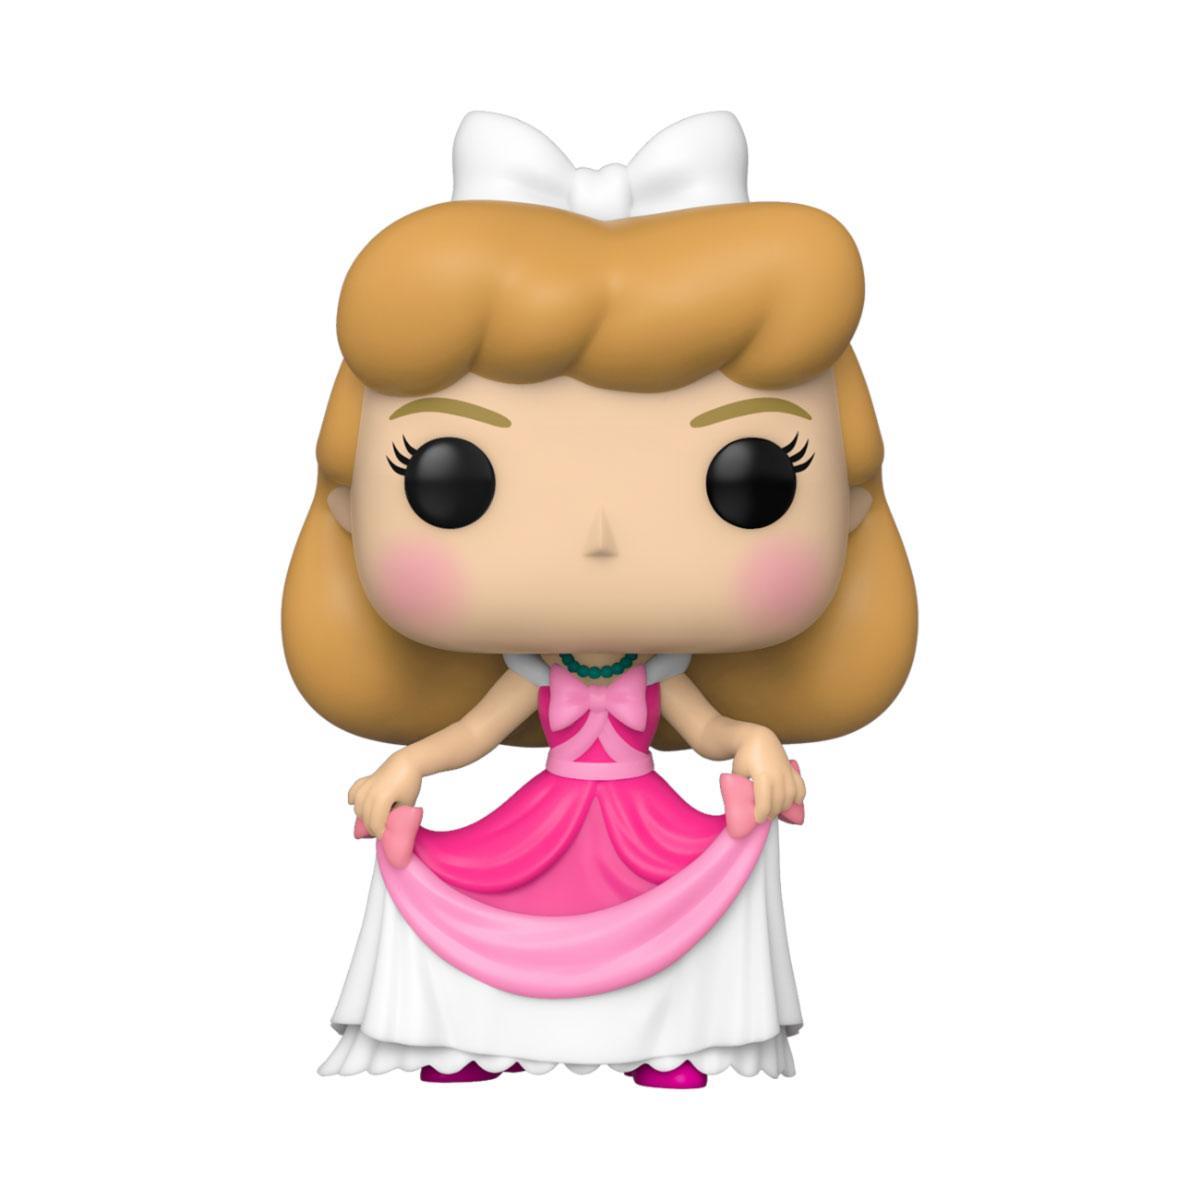 Cinderella POP! Vinyl Figure Cinderella (Pink Dress) 9 cm